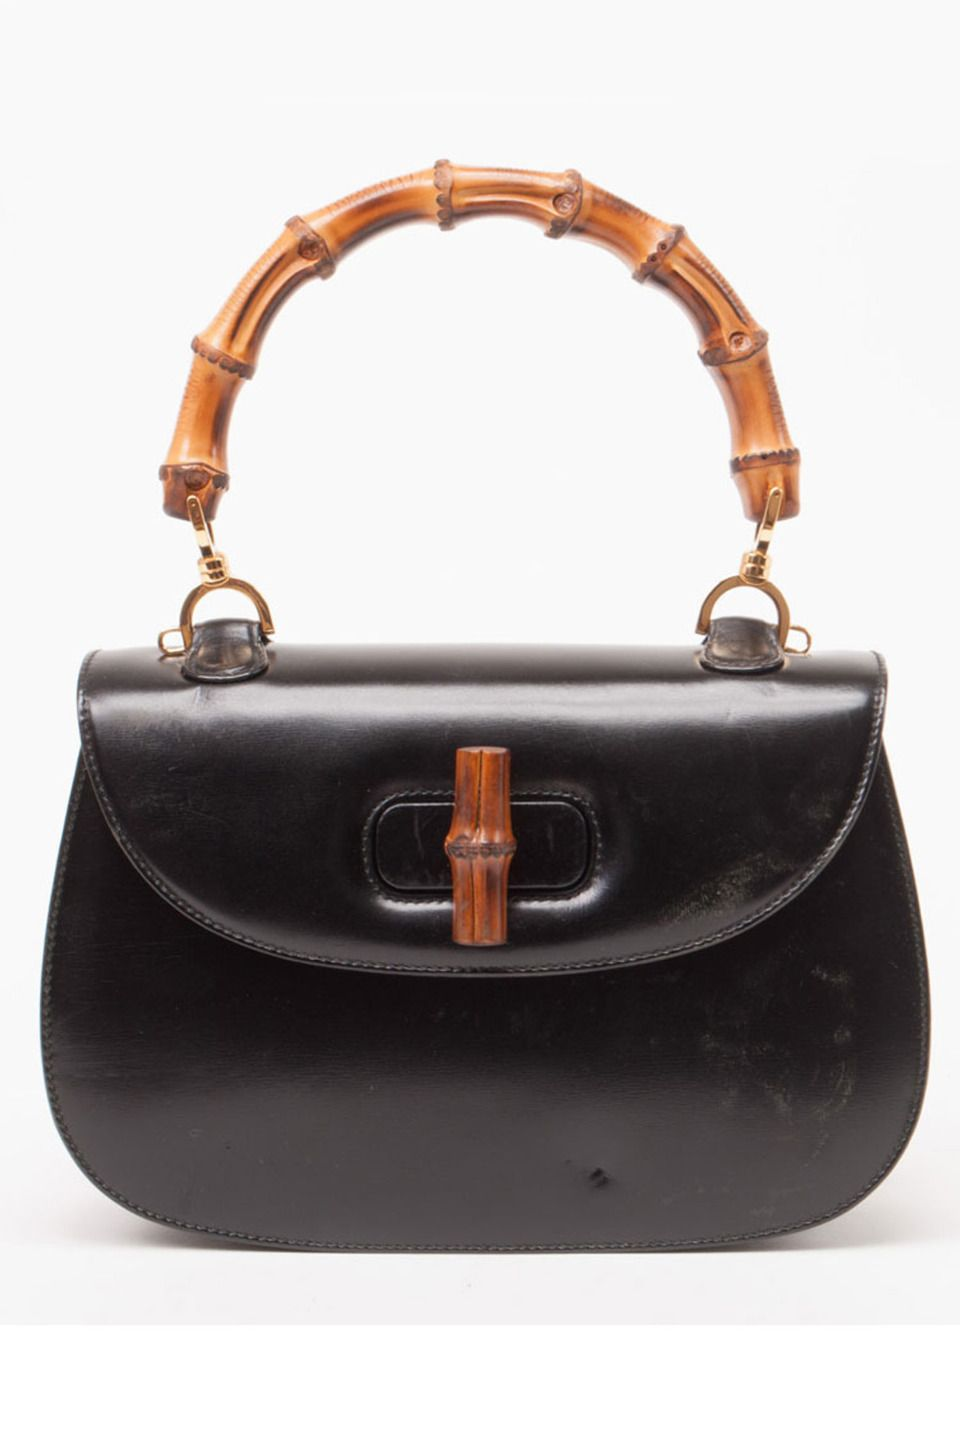 6376e1fe5f6c Gucci Kelly Bag With A Compact Mirror In Black. | Handbag Heaven ...